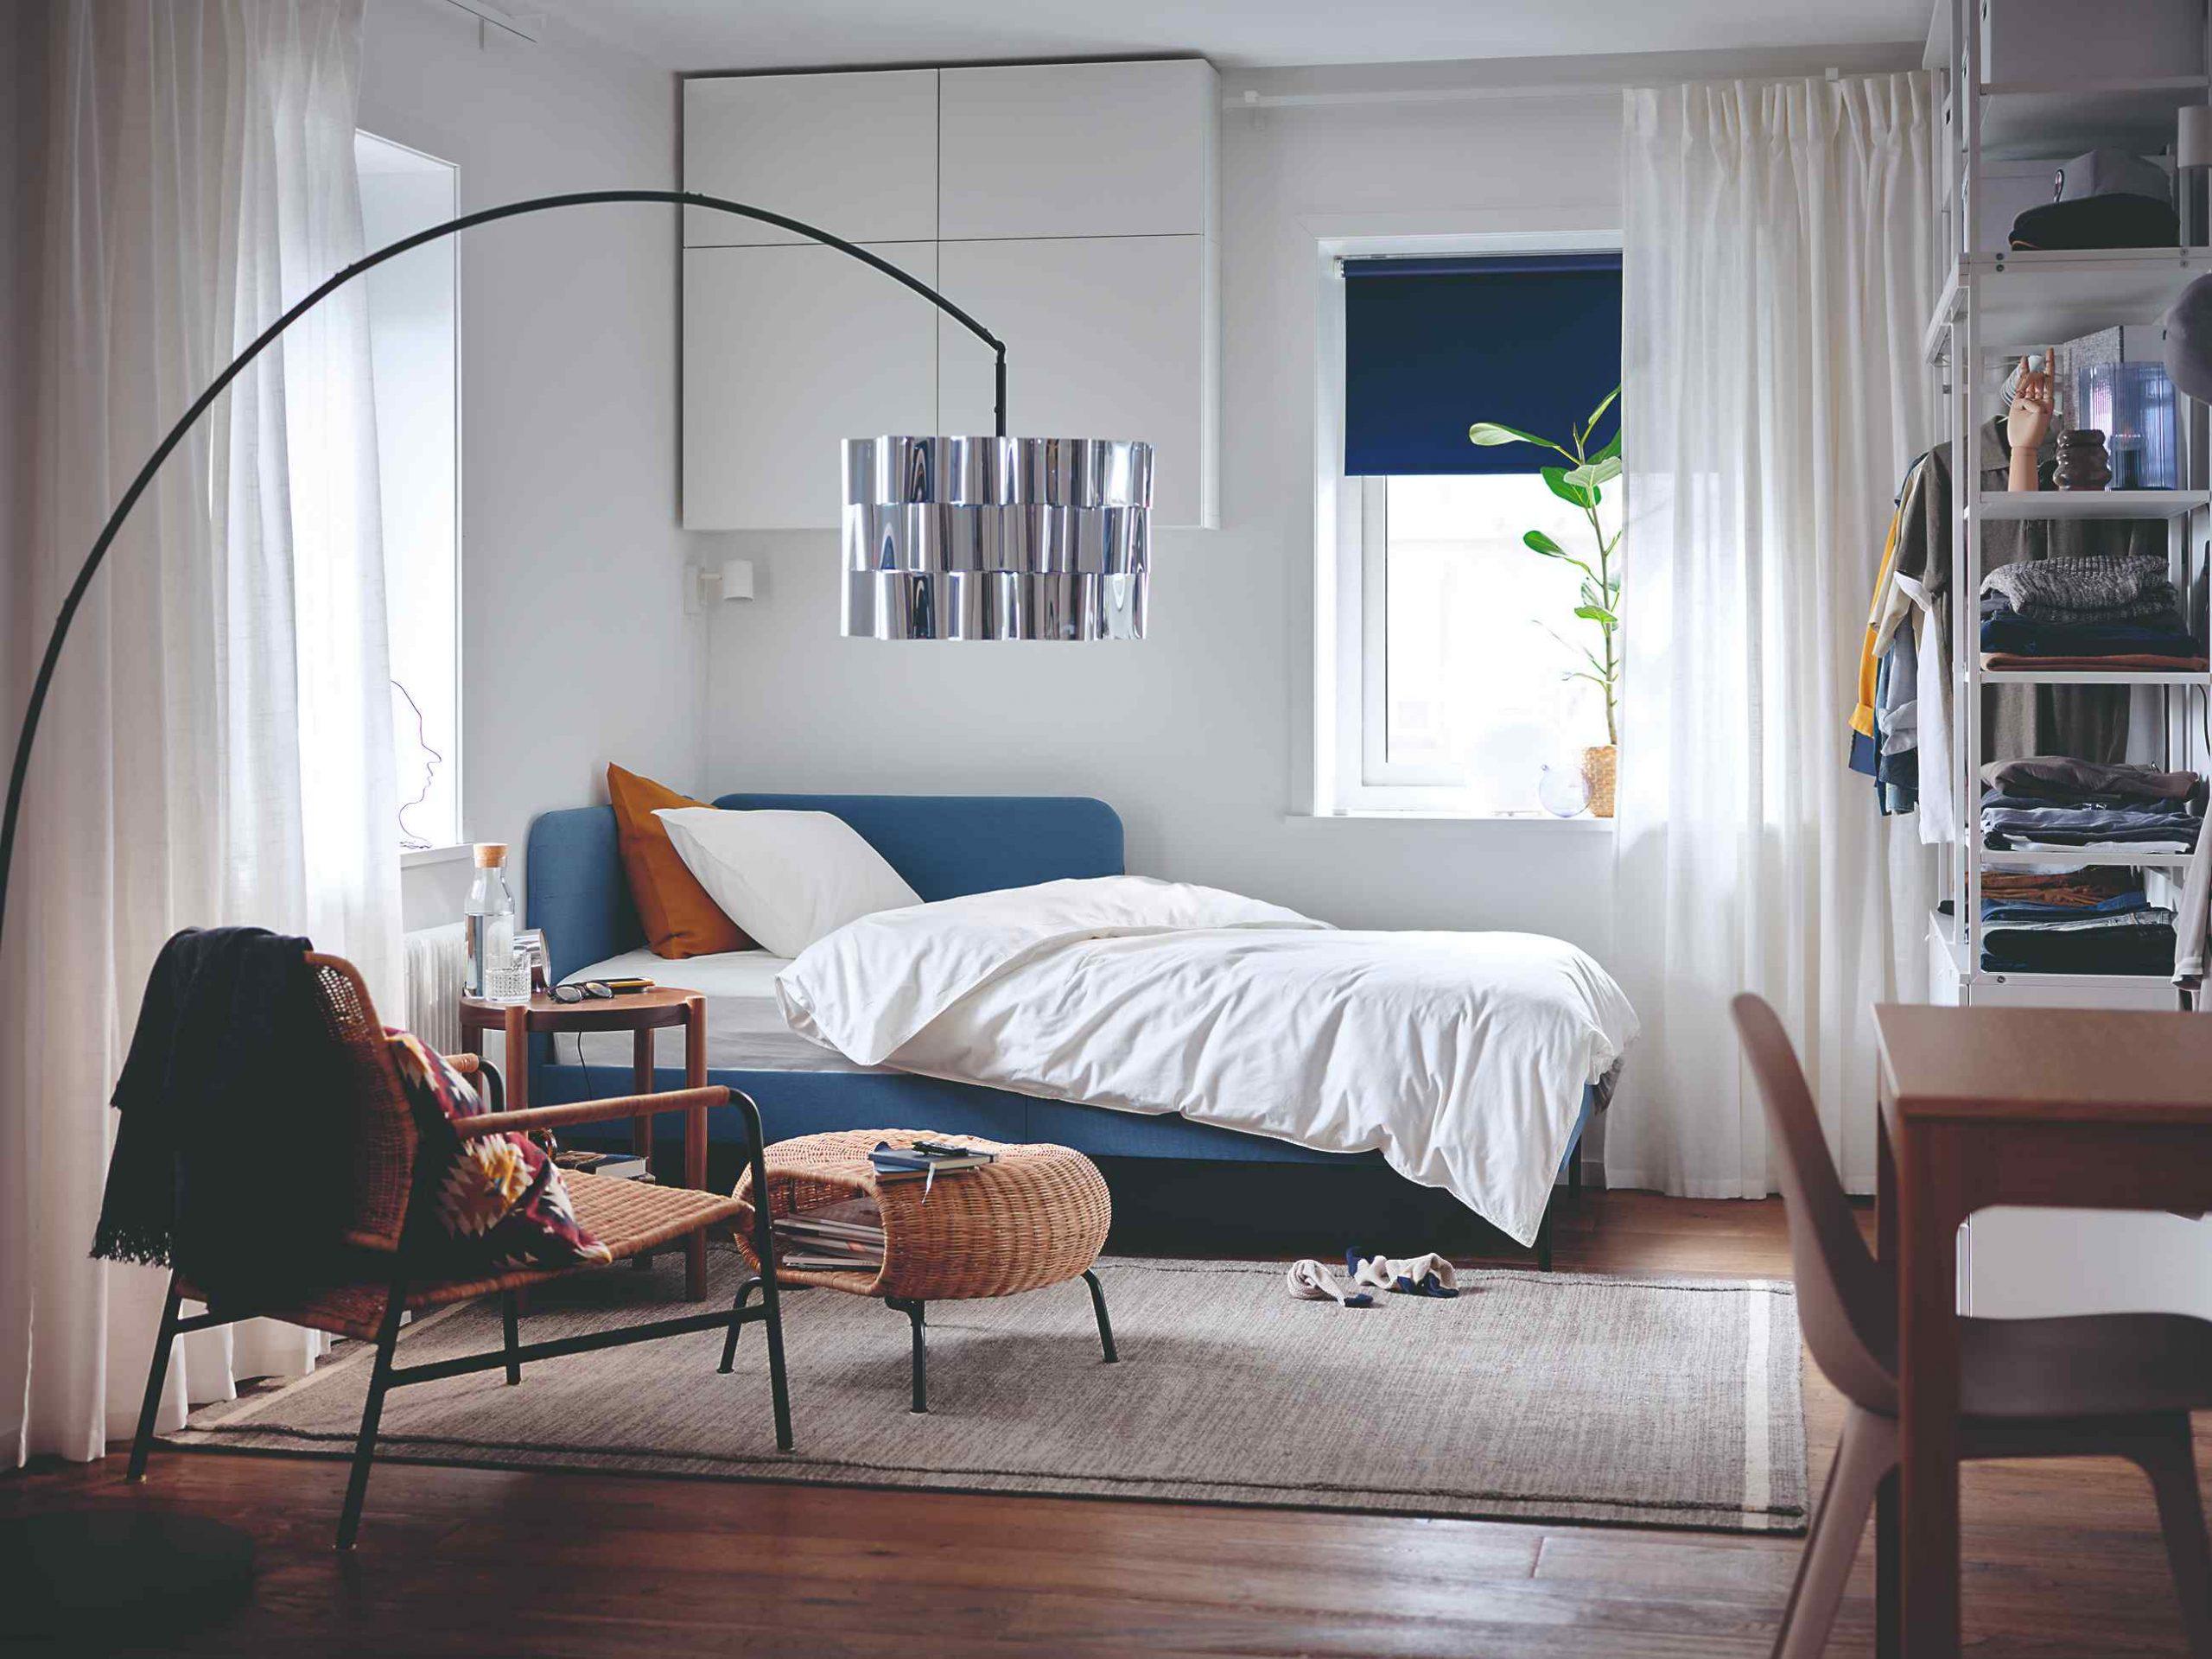 Rozkladacia pohovka v izbe s dizajnovým svietidlom